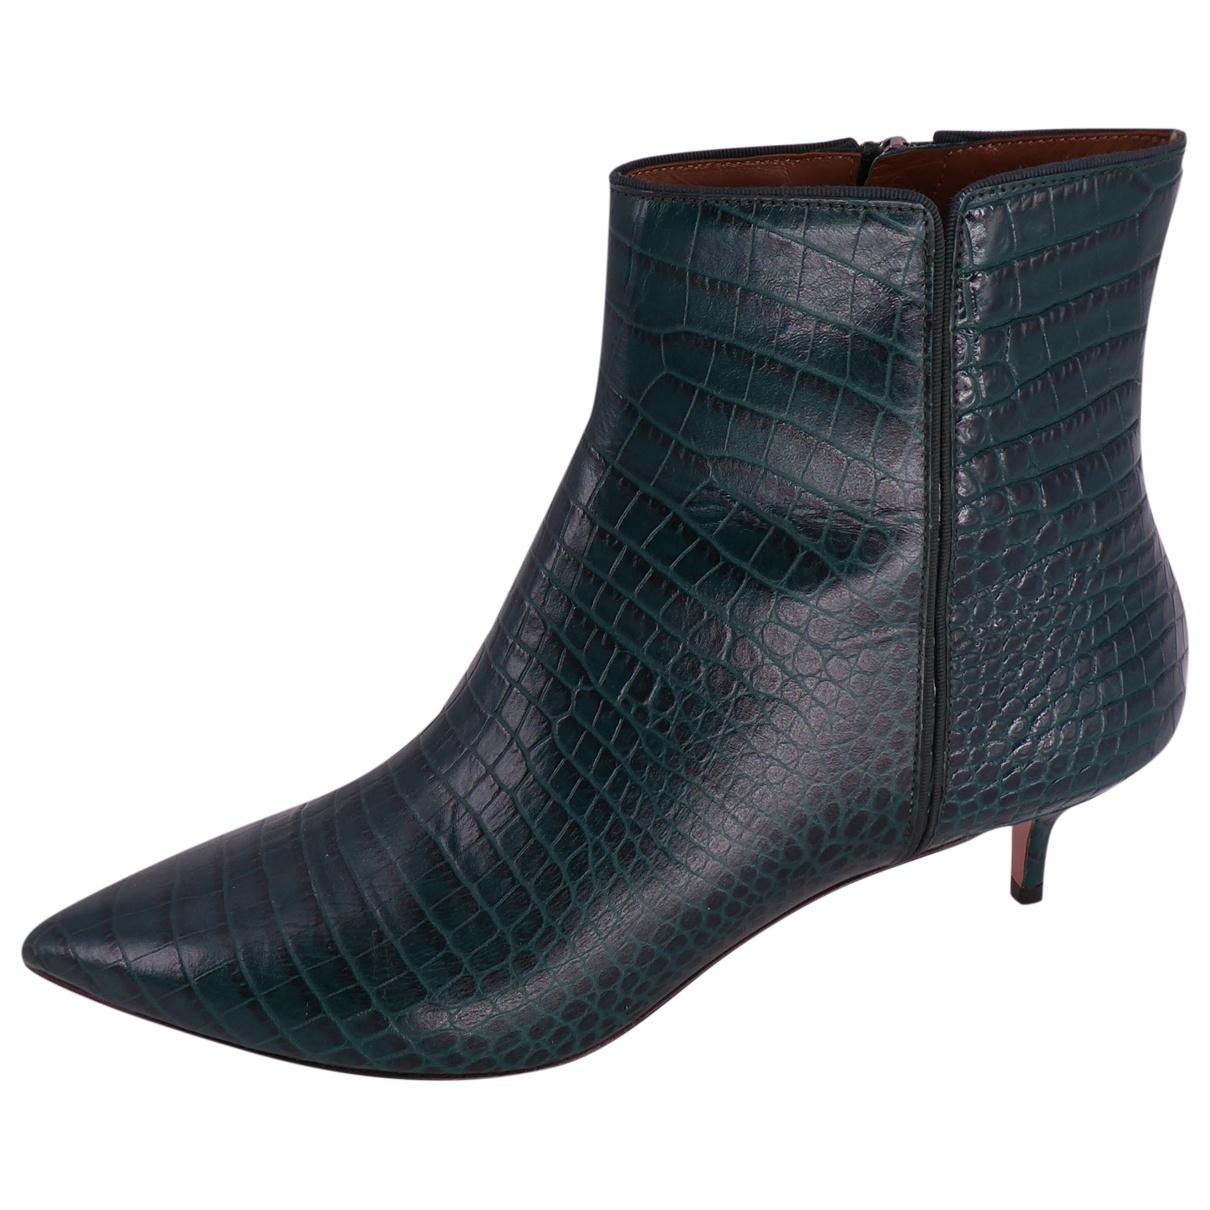 Aquazzura - Boots   pour femme en cuir - vert